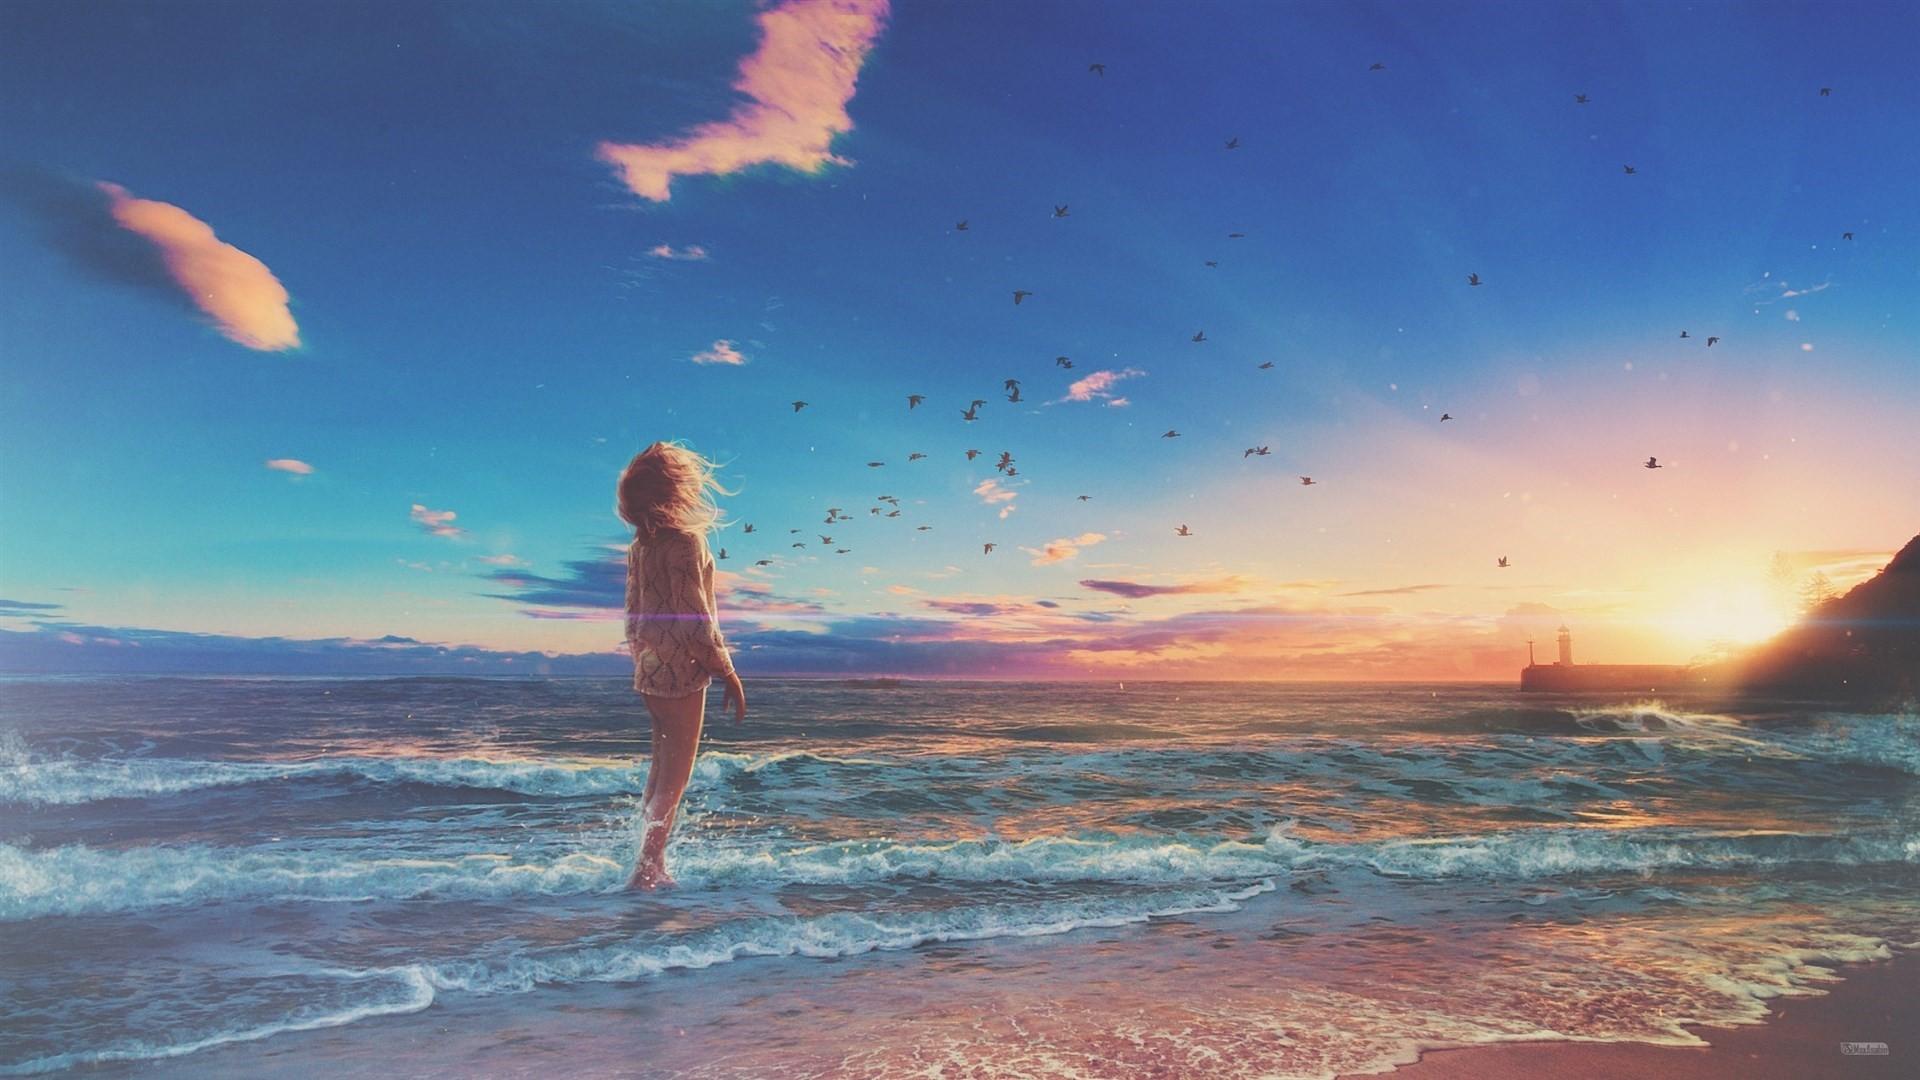 Anime Beach desktop wallpaper hd